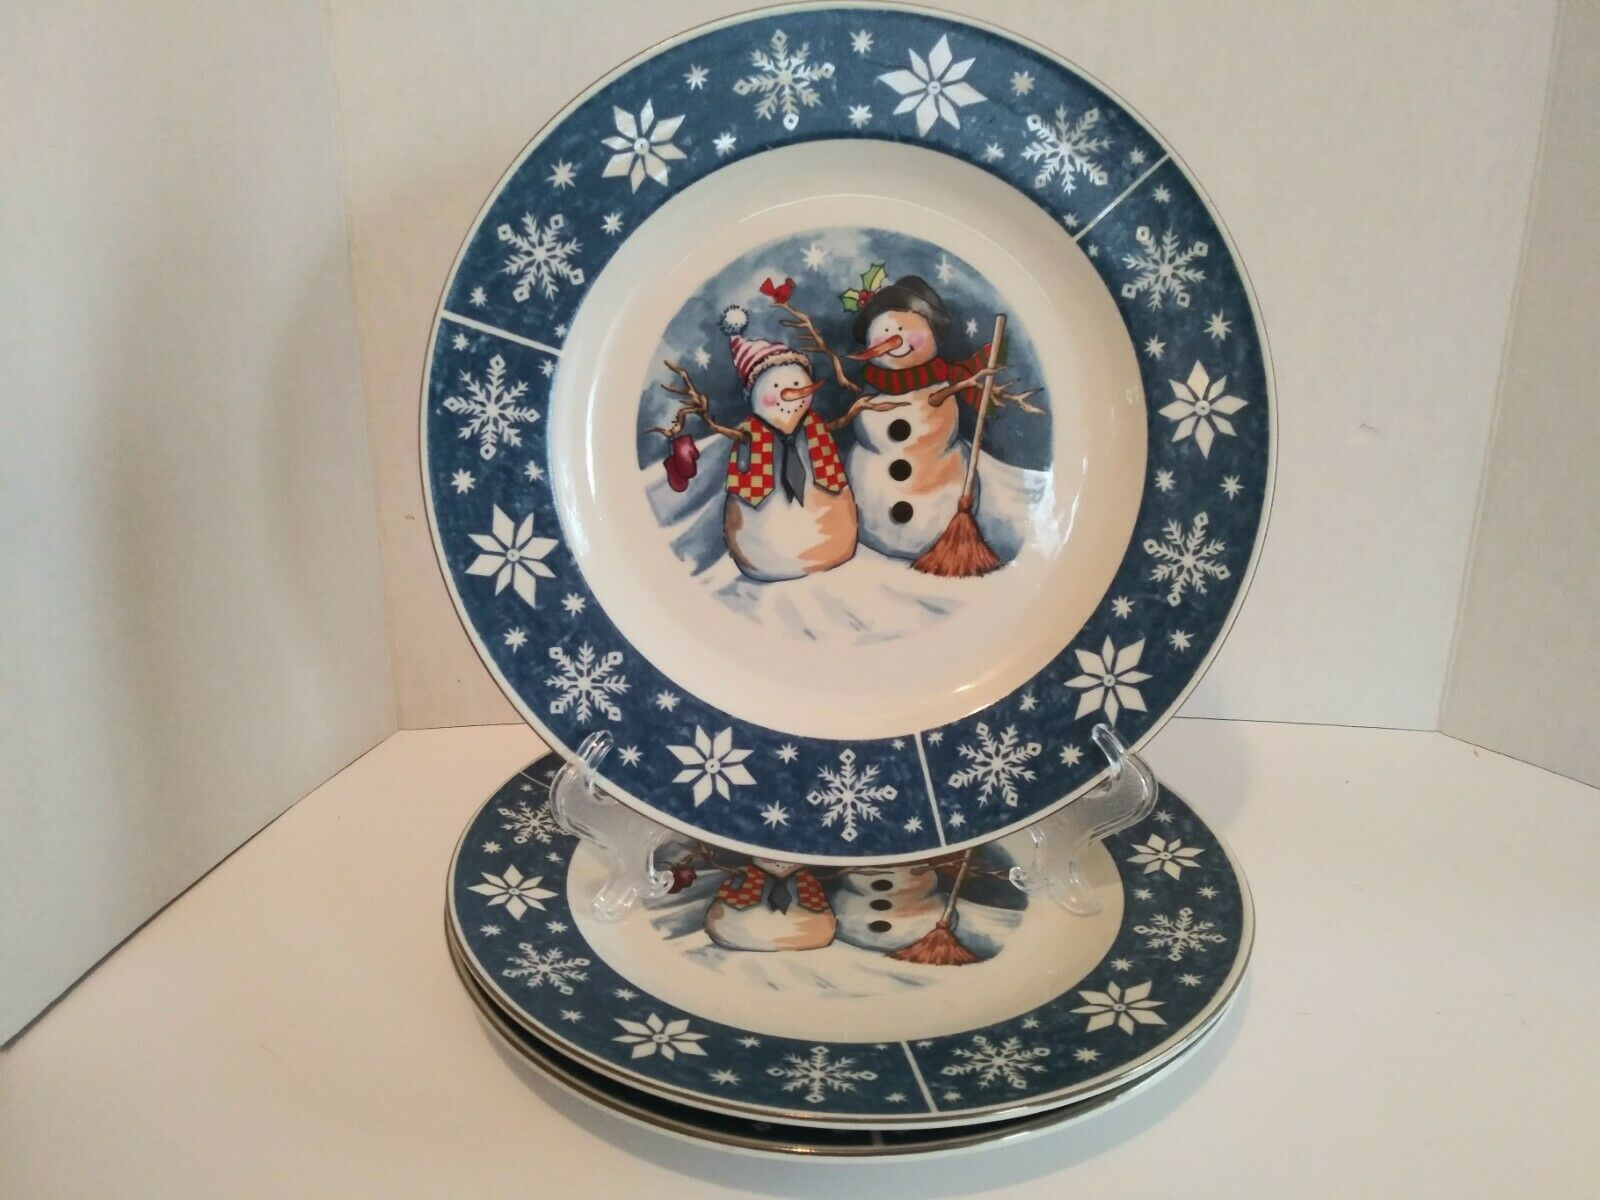 My Ebay Active Plates Snowman Friend Christmas Christmas Gingerbread House